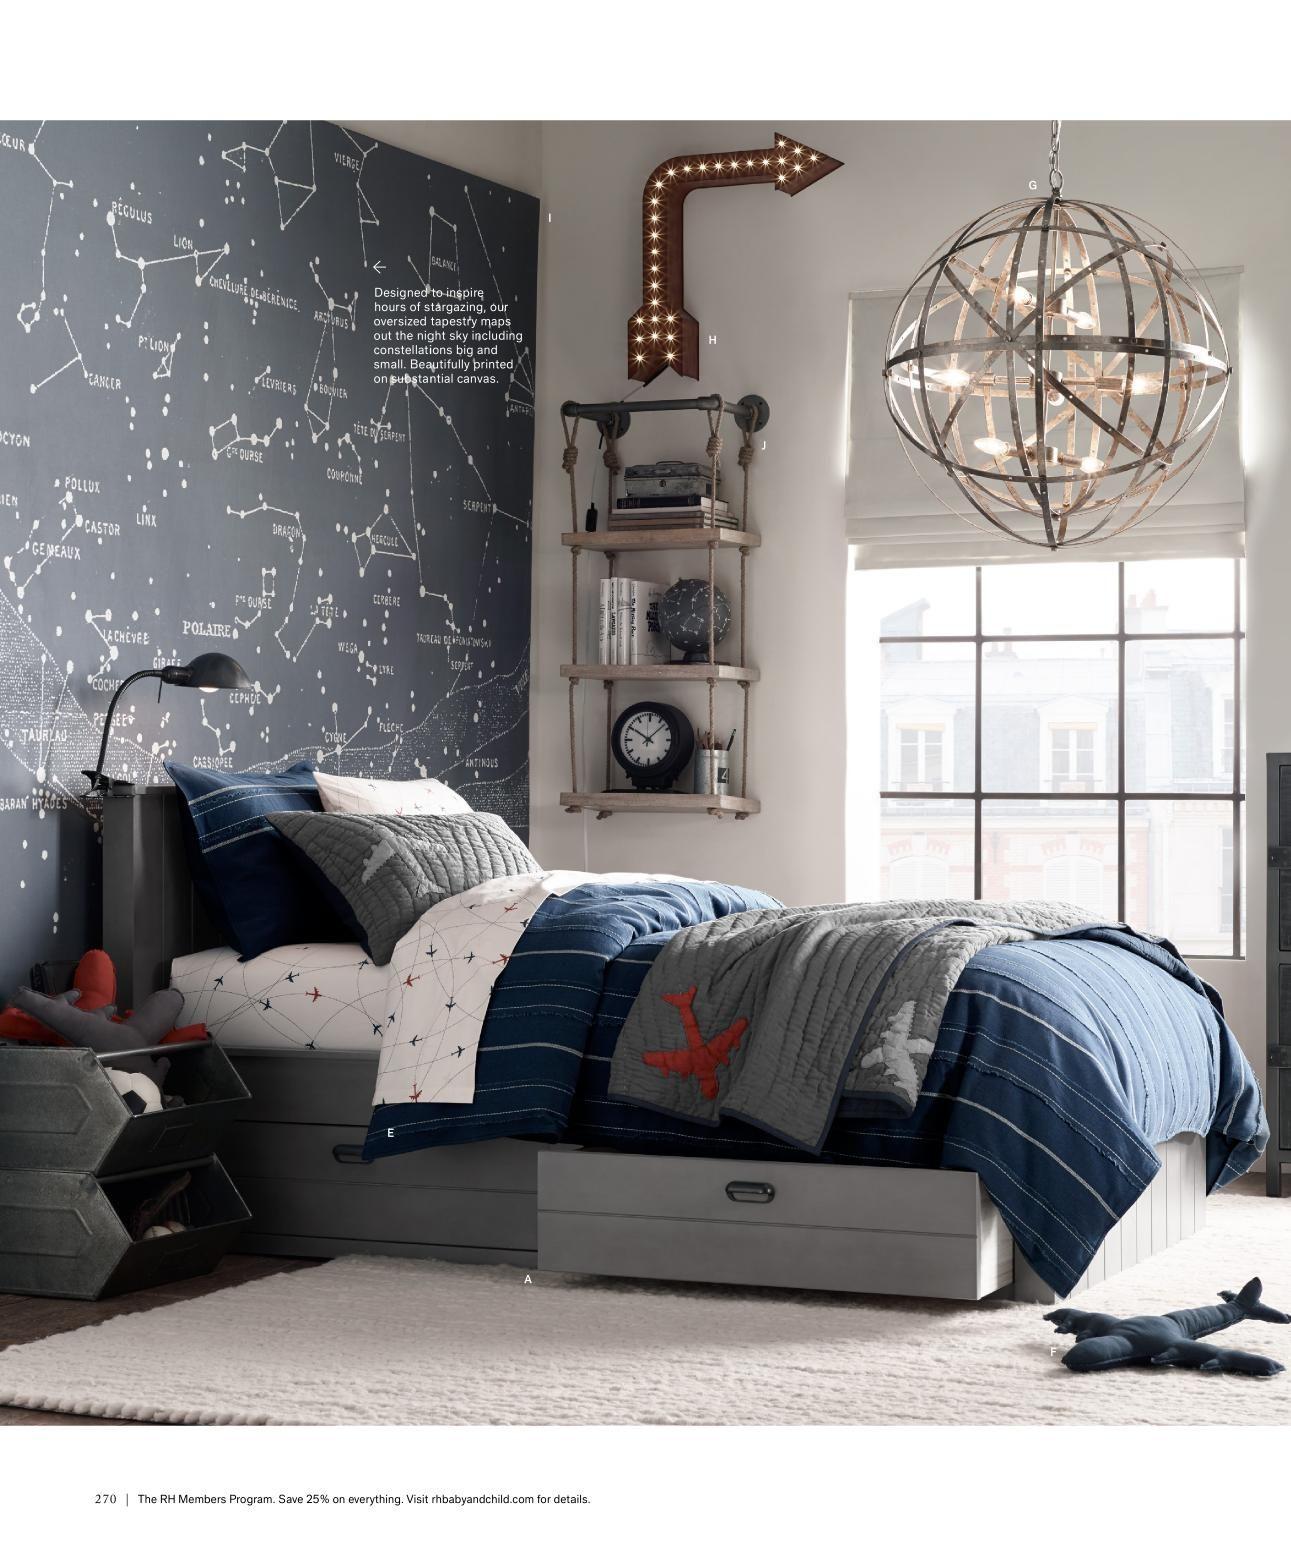 Inspirational Boy Rooms Decorating Ideas